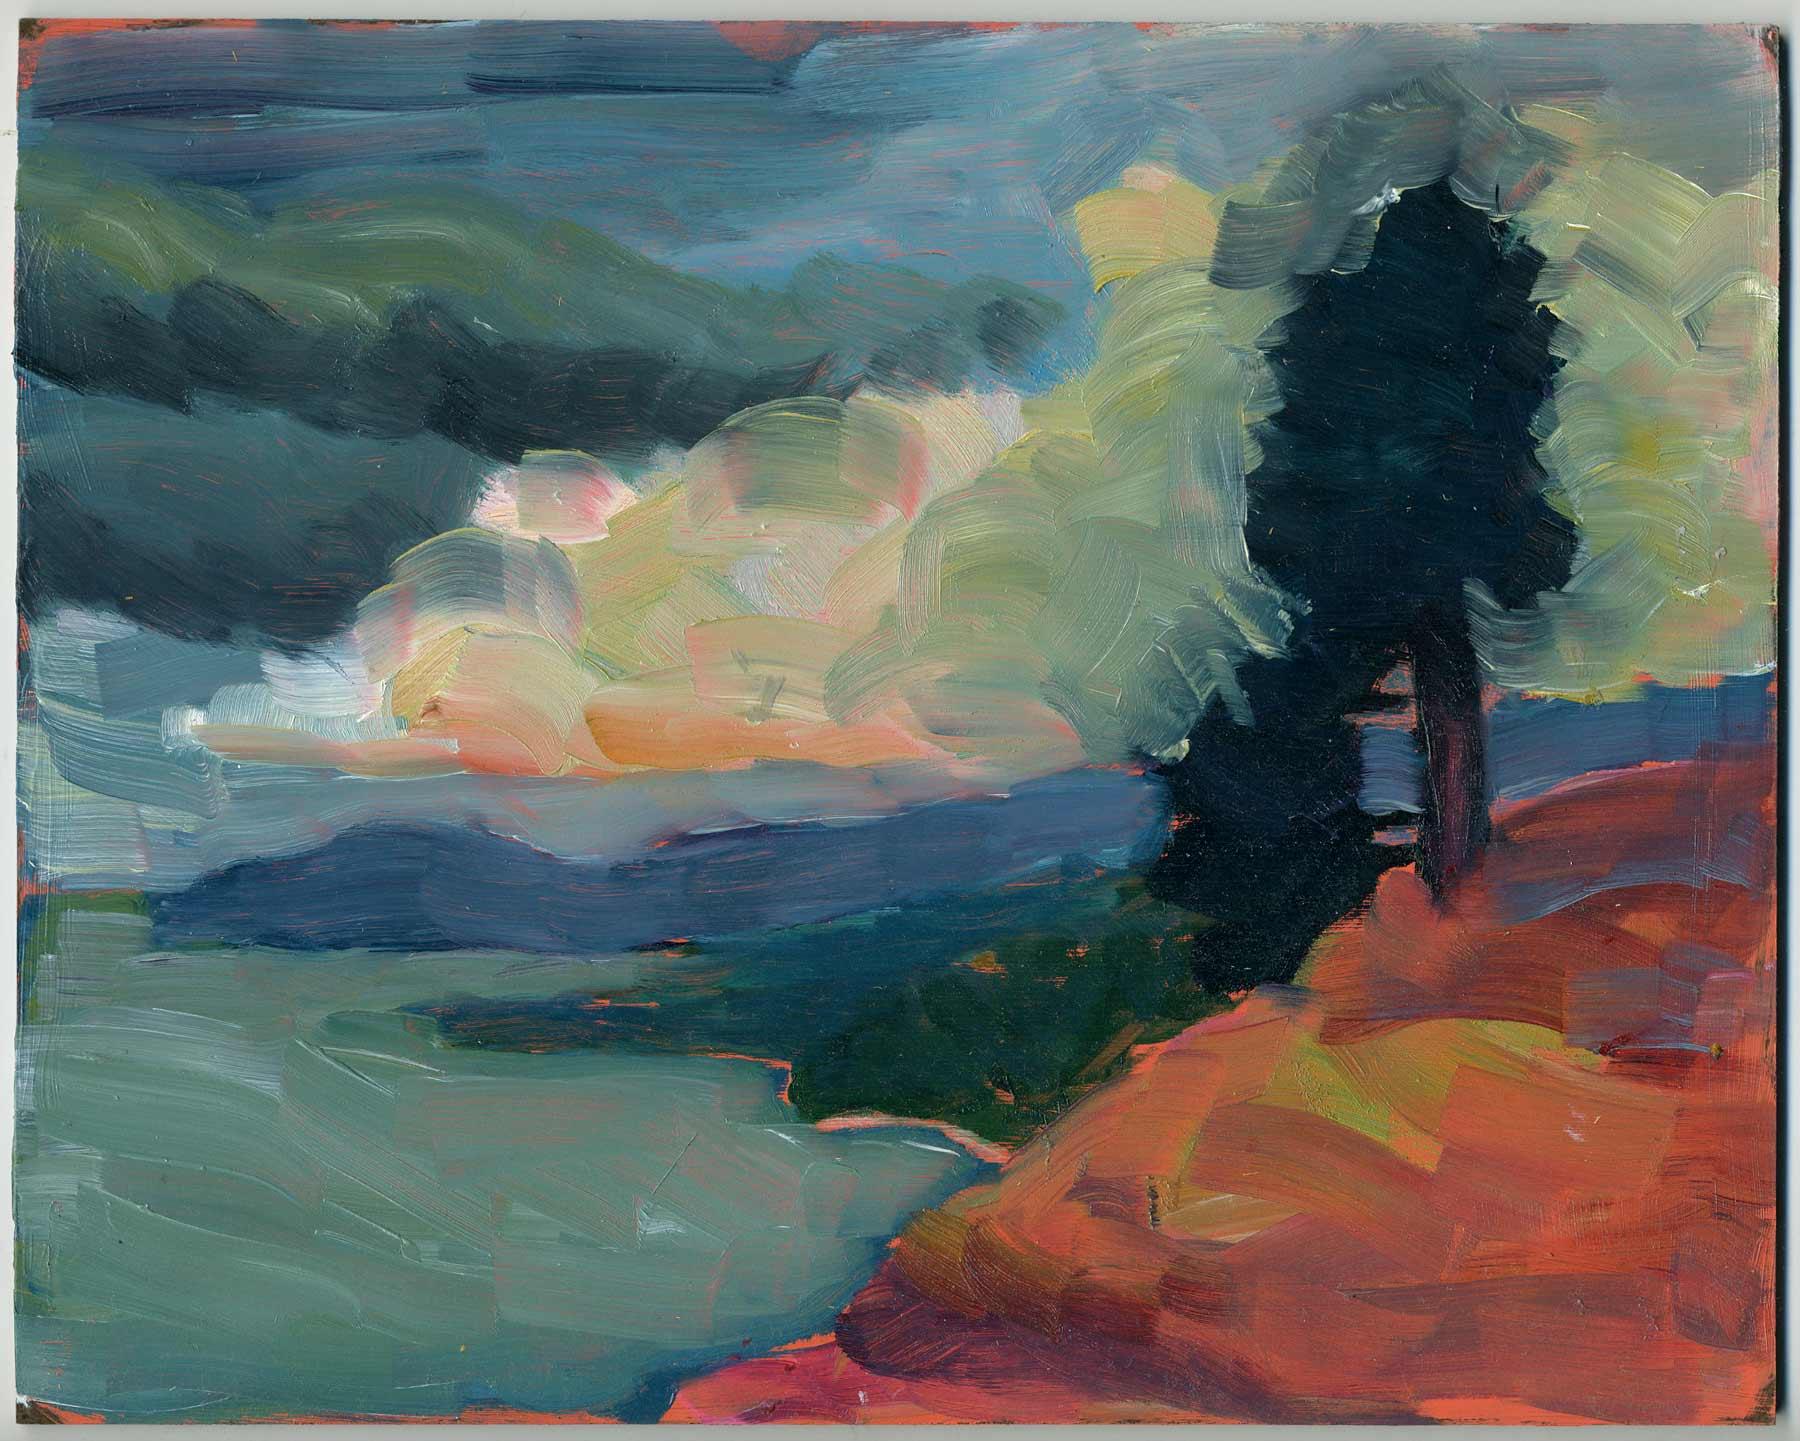 Gathering Storm, Tettegouche